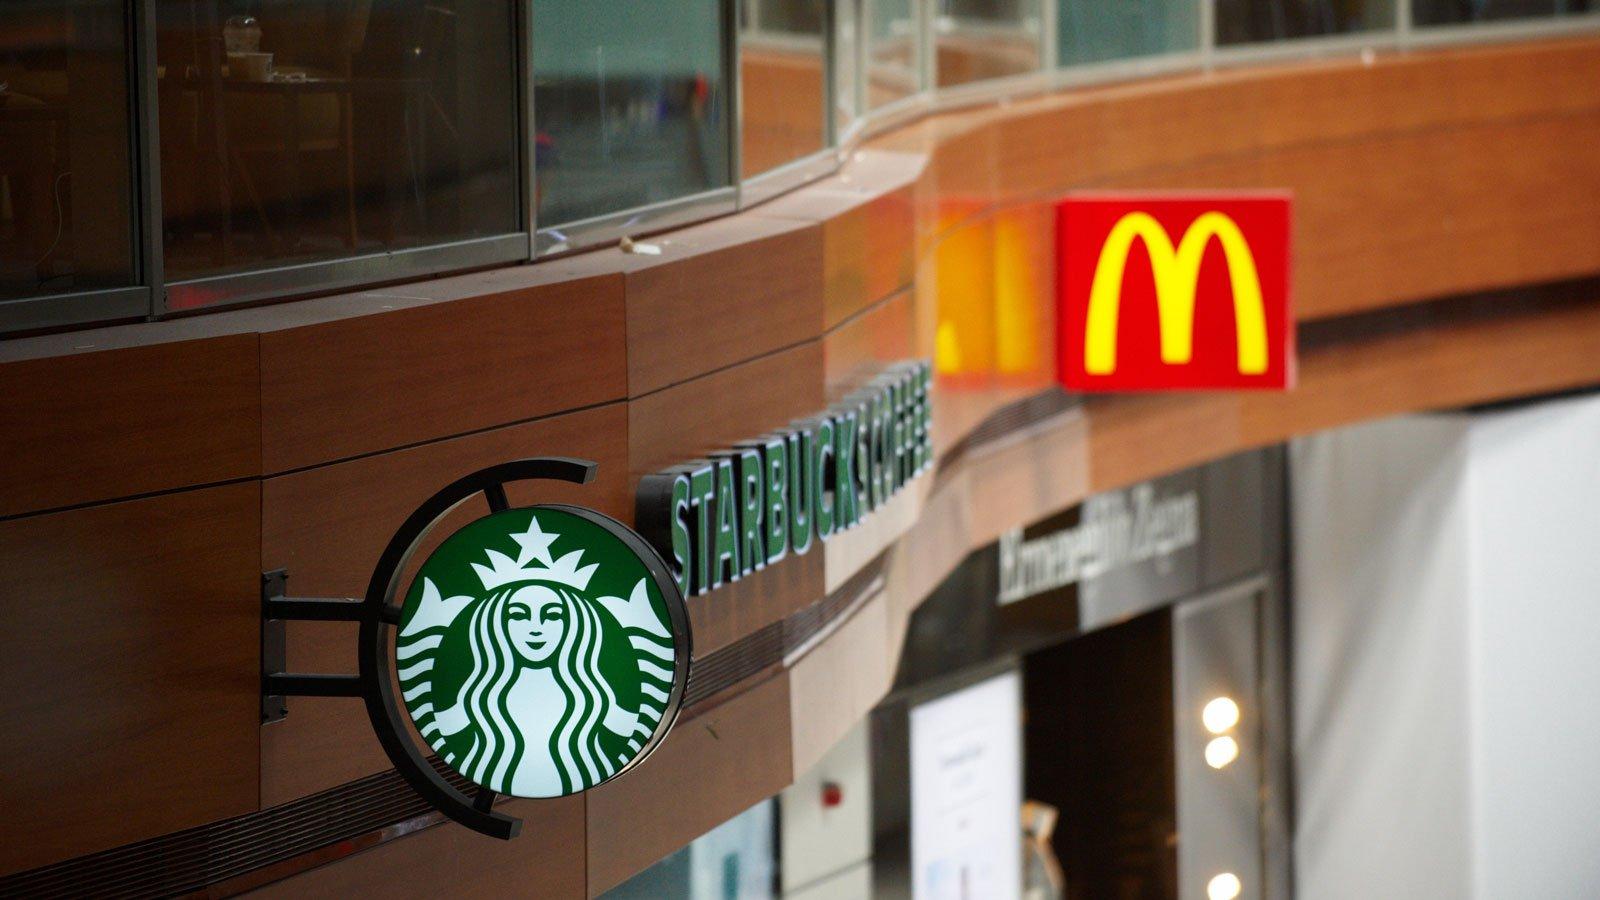 EC: McDonald's Customers More Loyal Than Starbucks